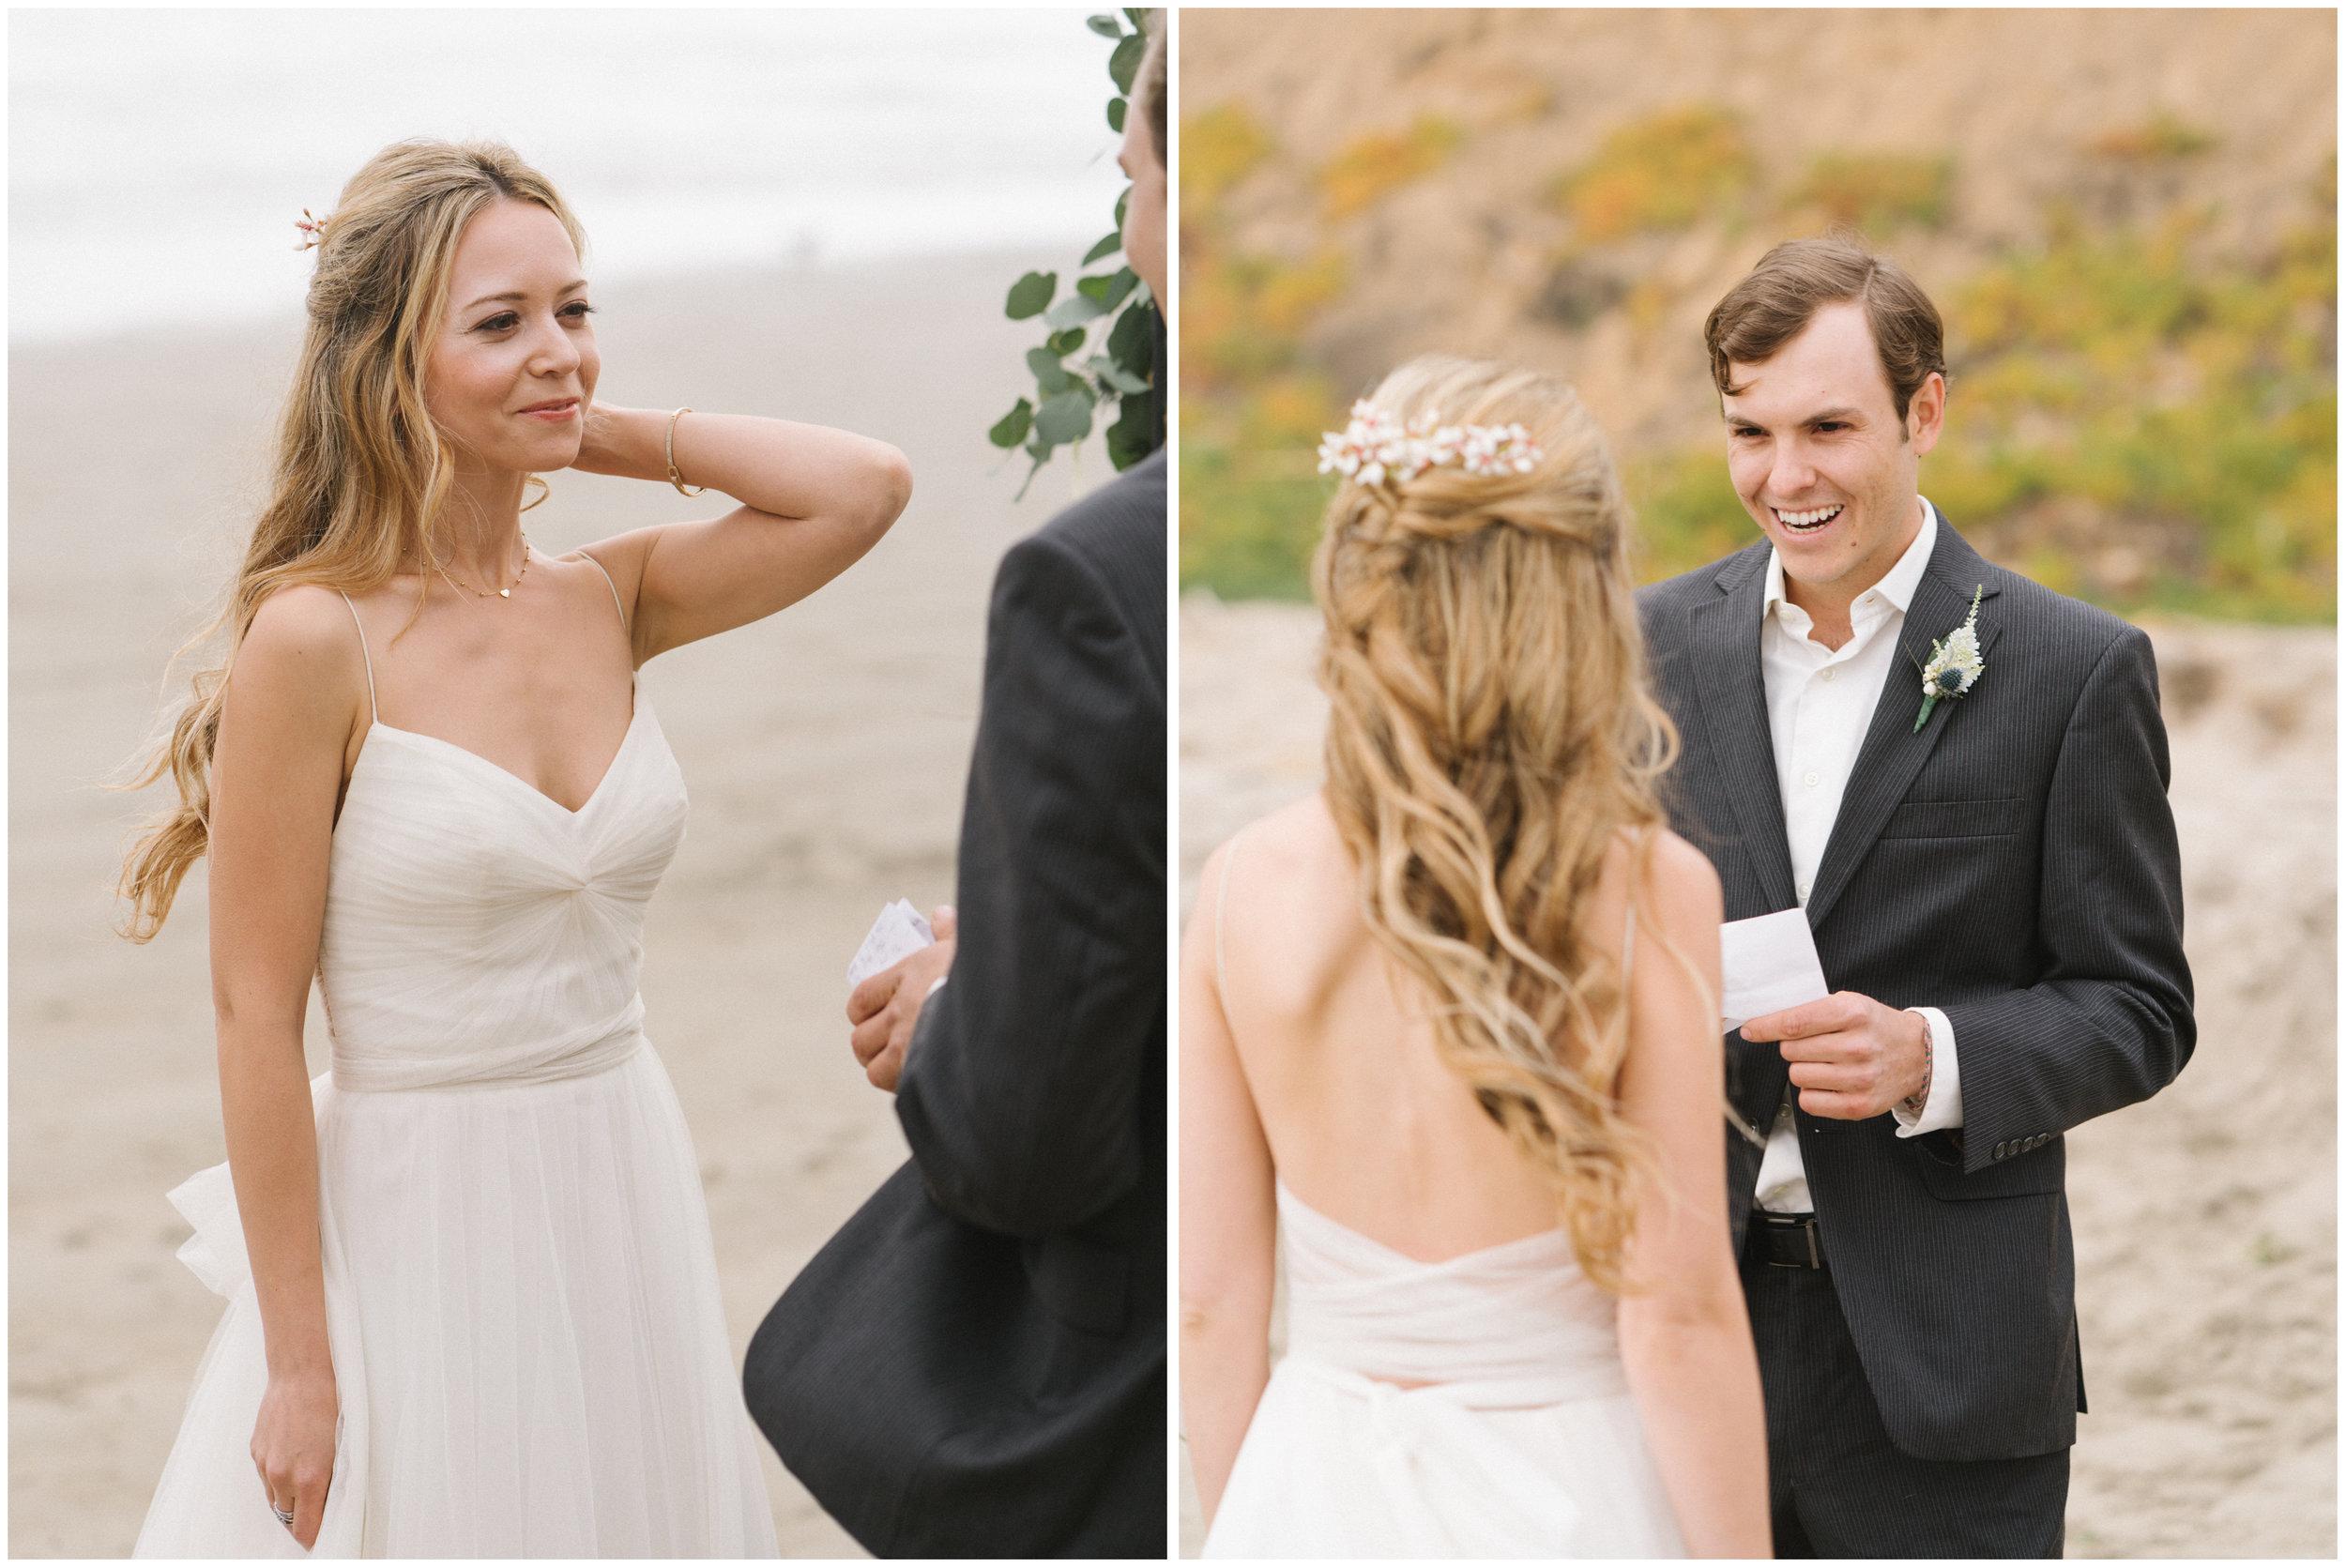 Santa Barbara Elopement Wedding Photographer - Pinnel Photography-08.jpg